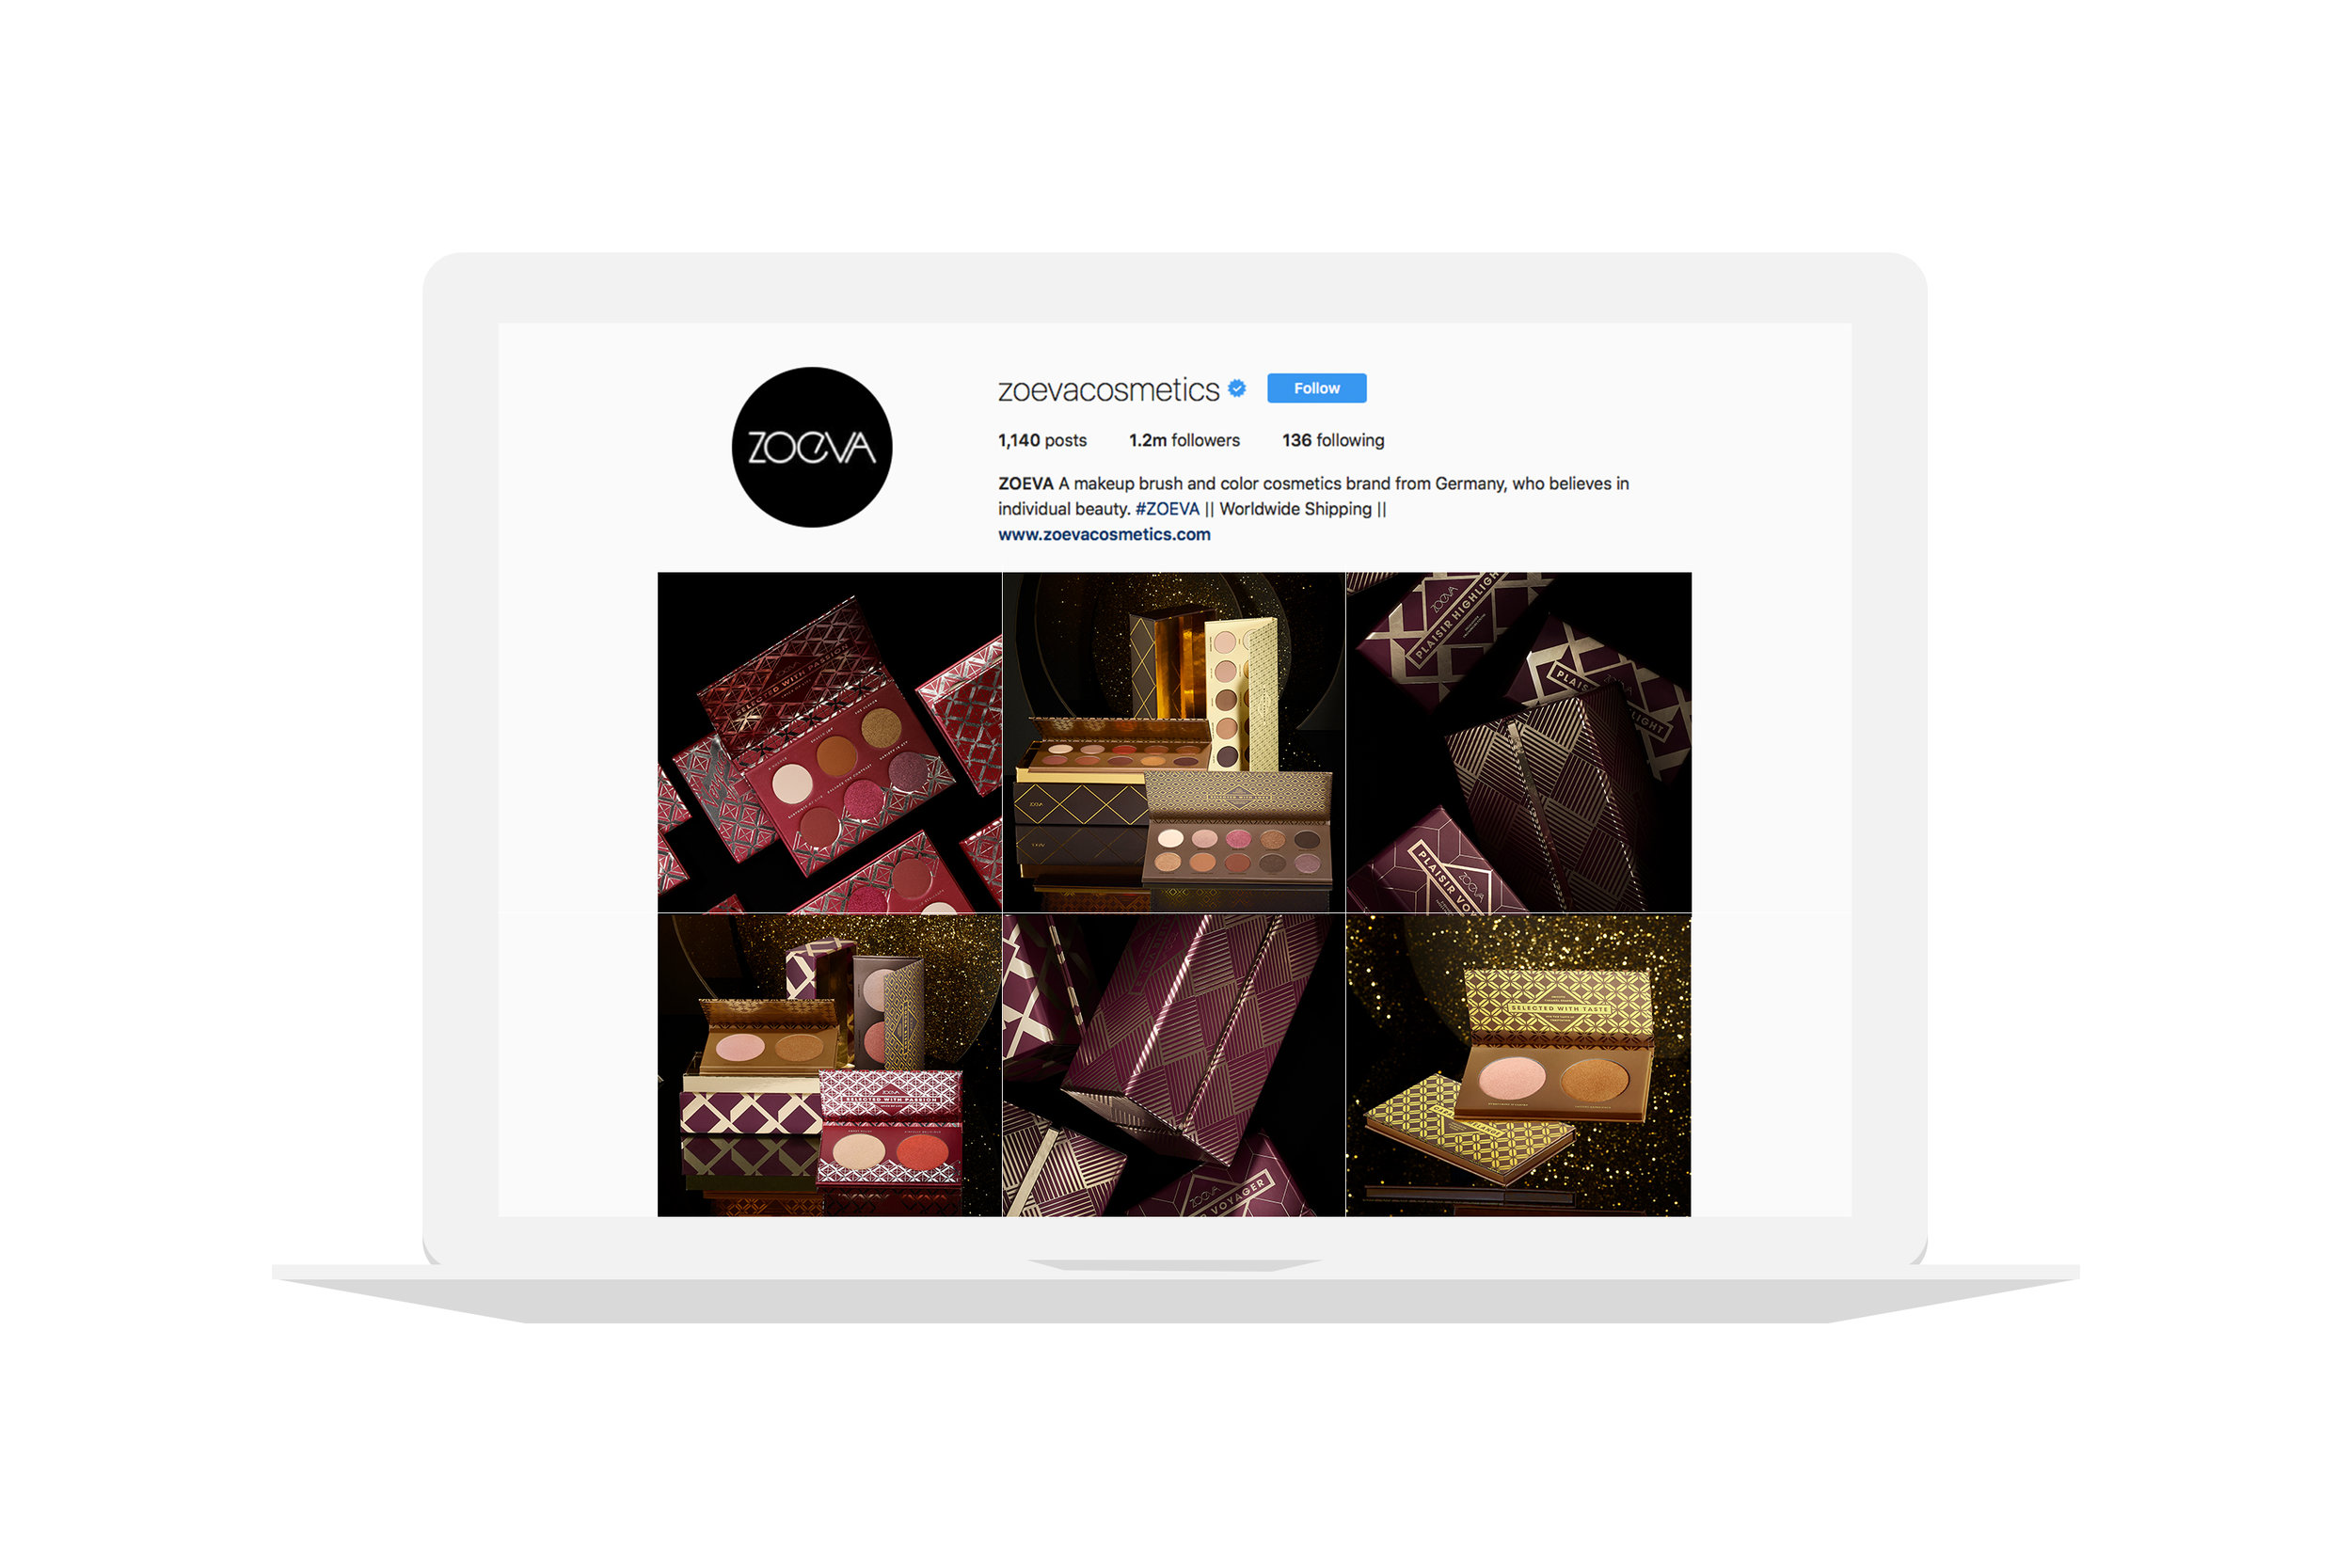 Zoeva-website-Plaisir-social.jpg